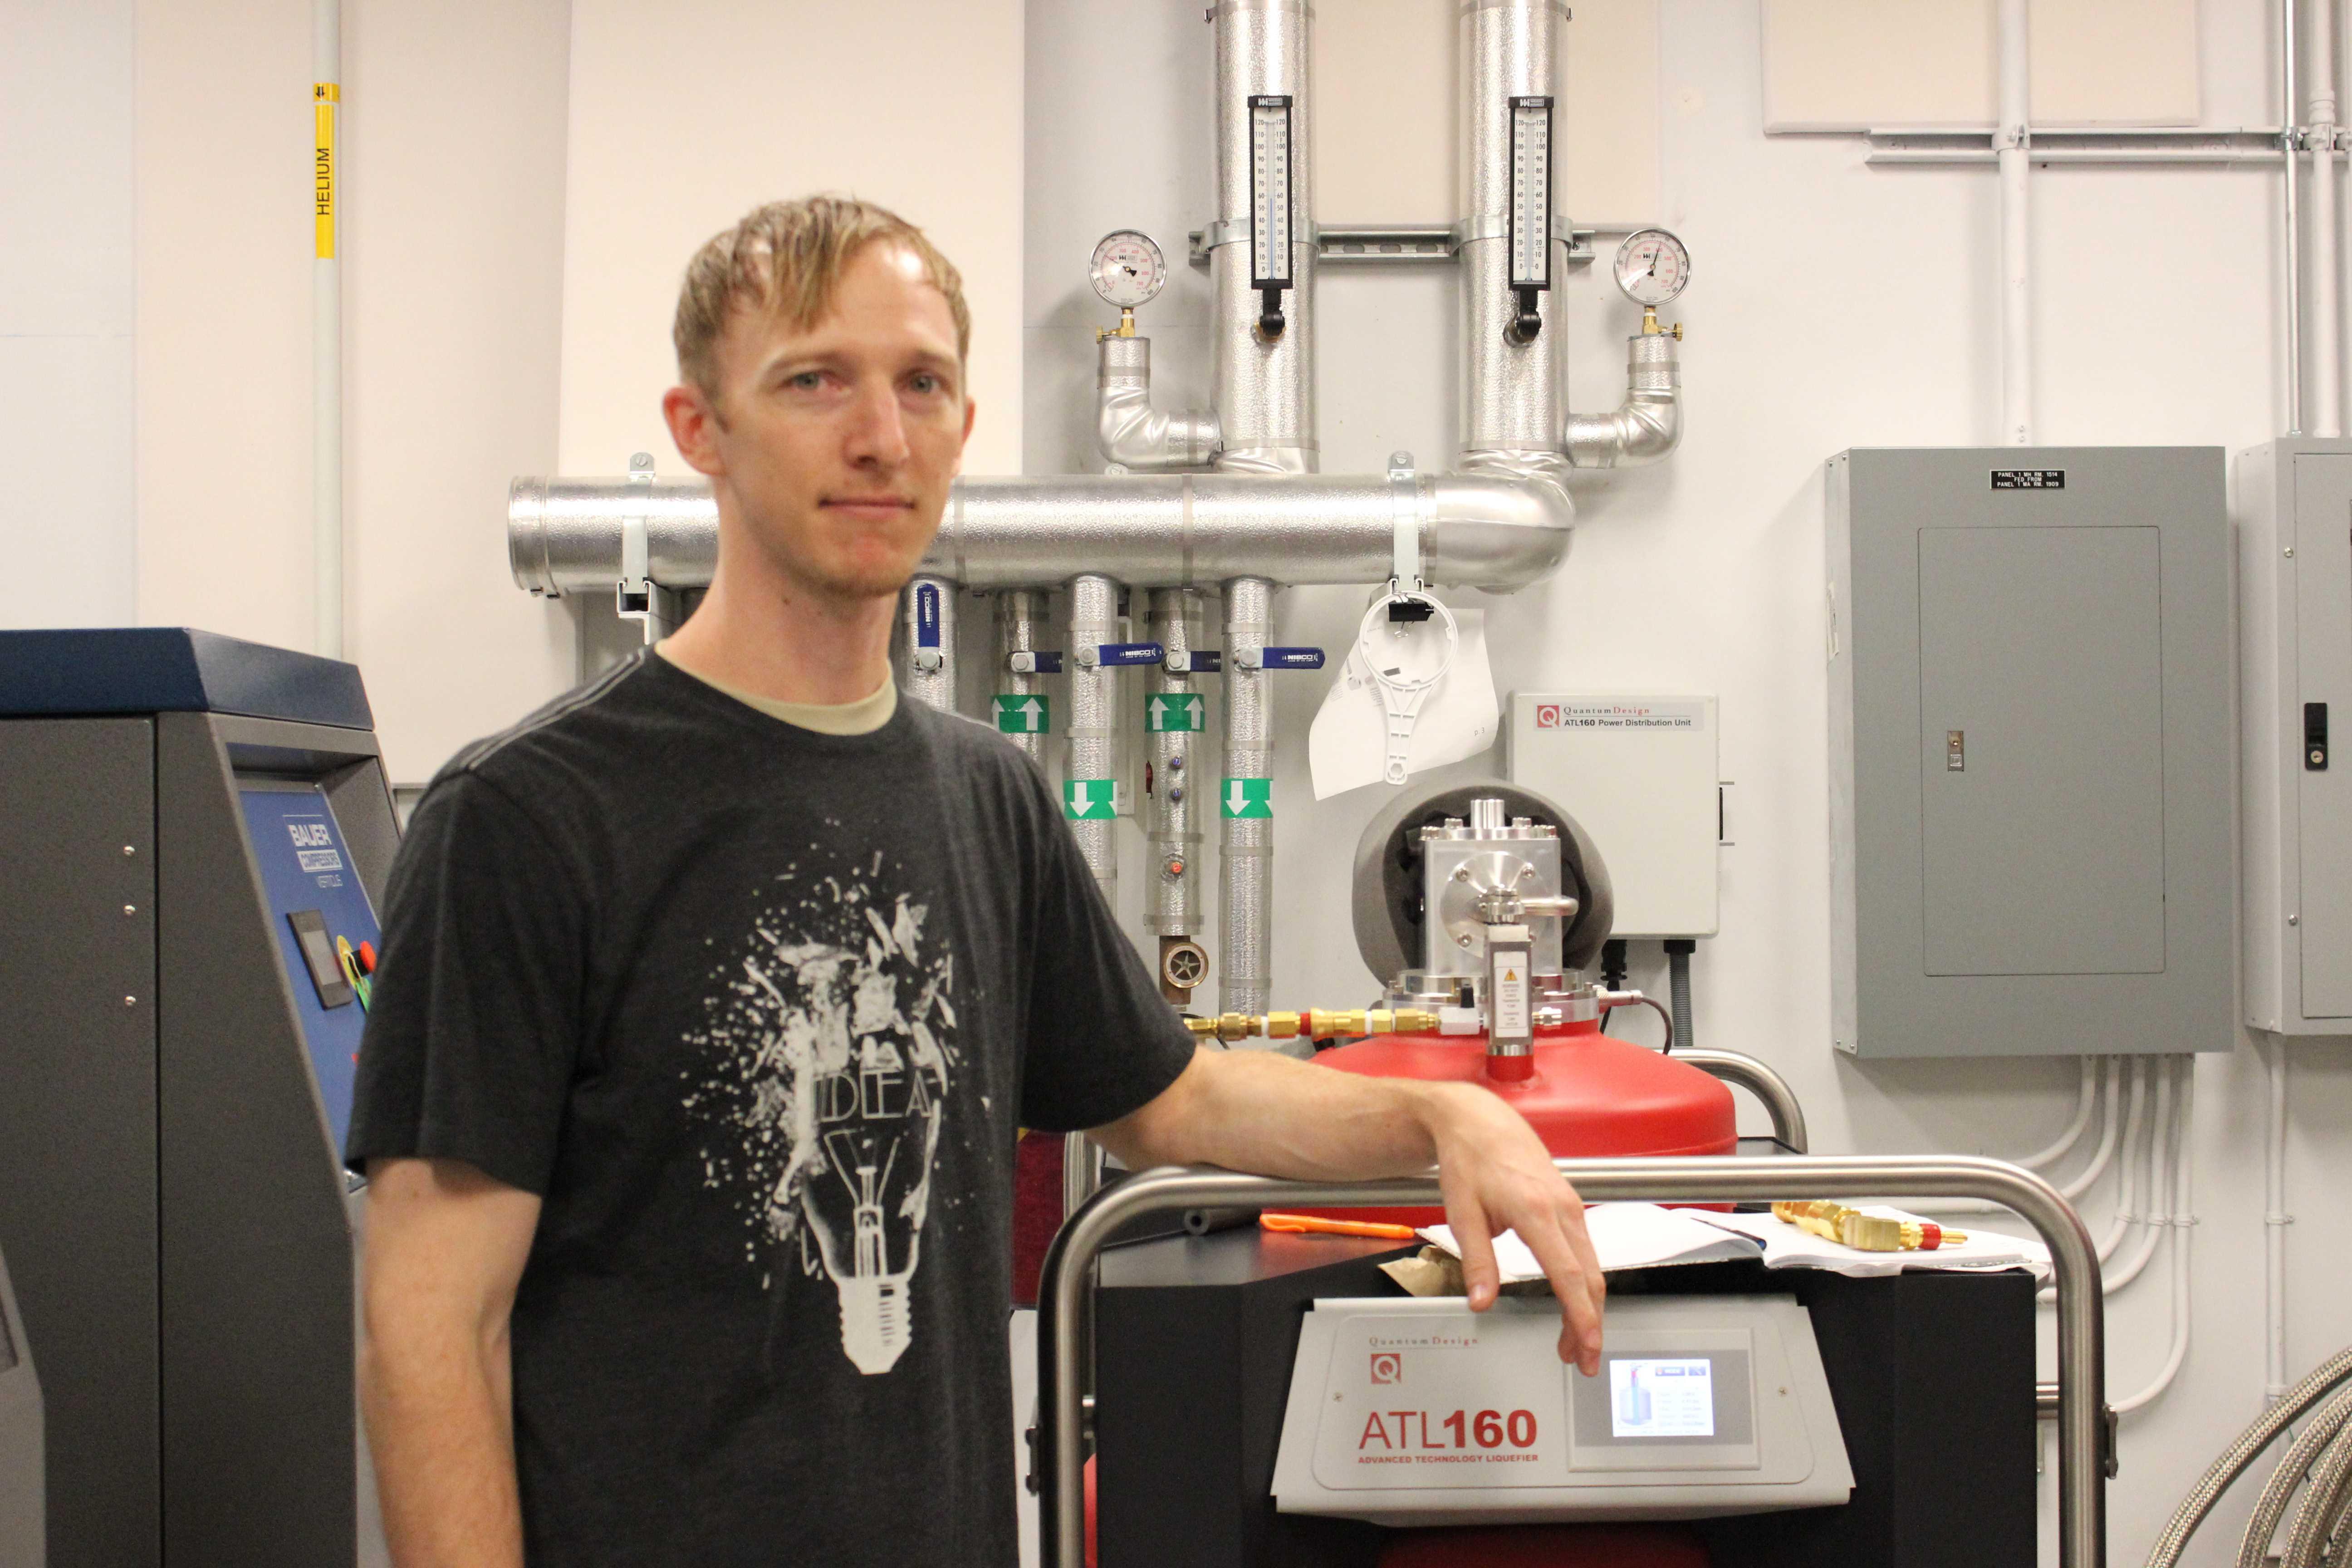 UNF undergrads have rare access to helium liquefier